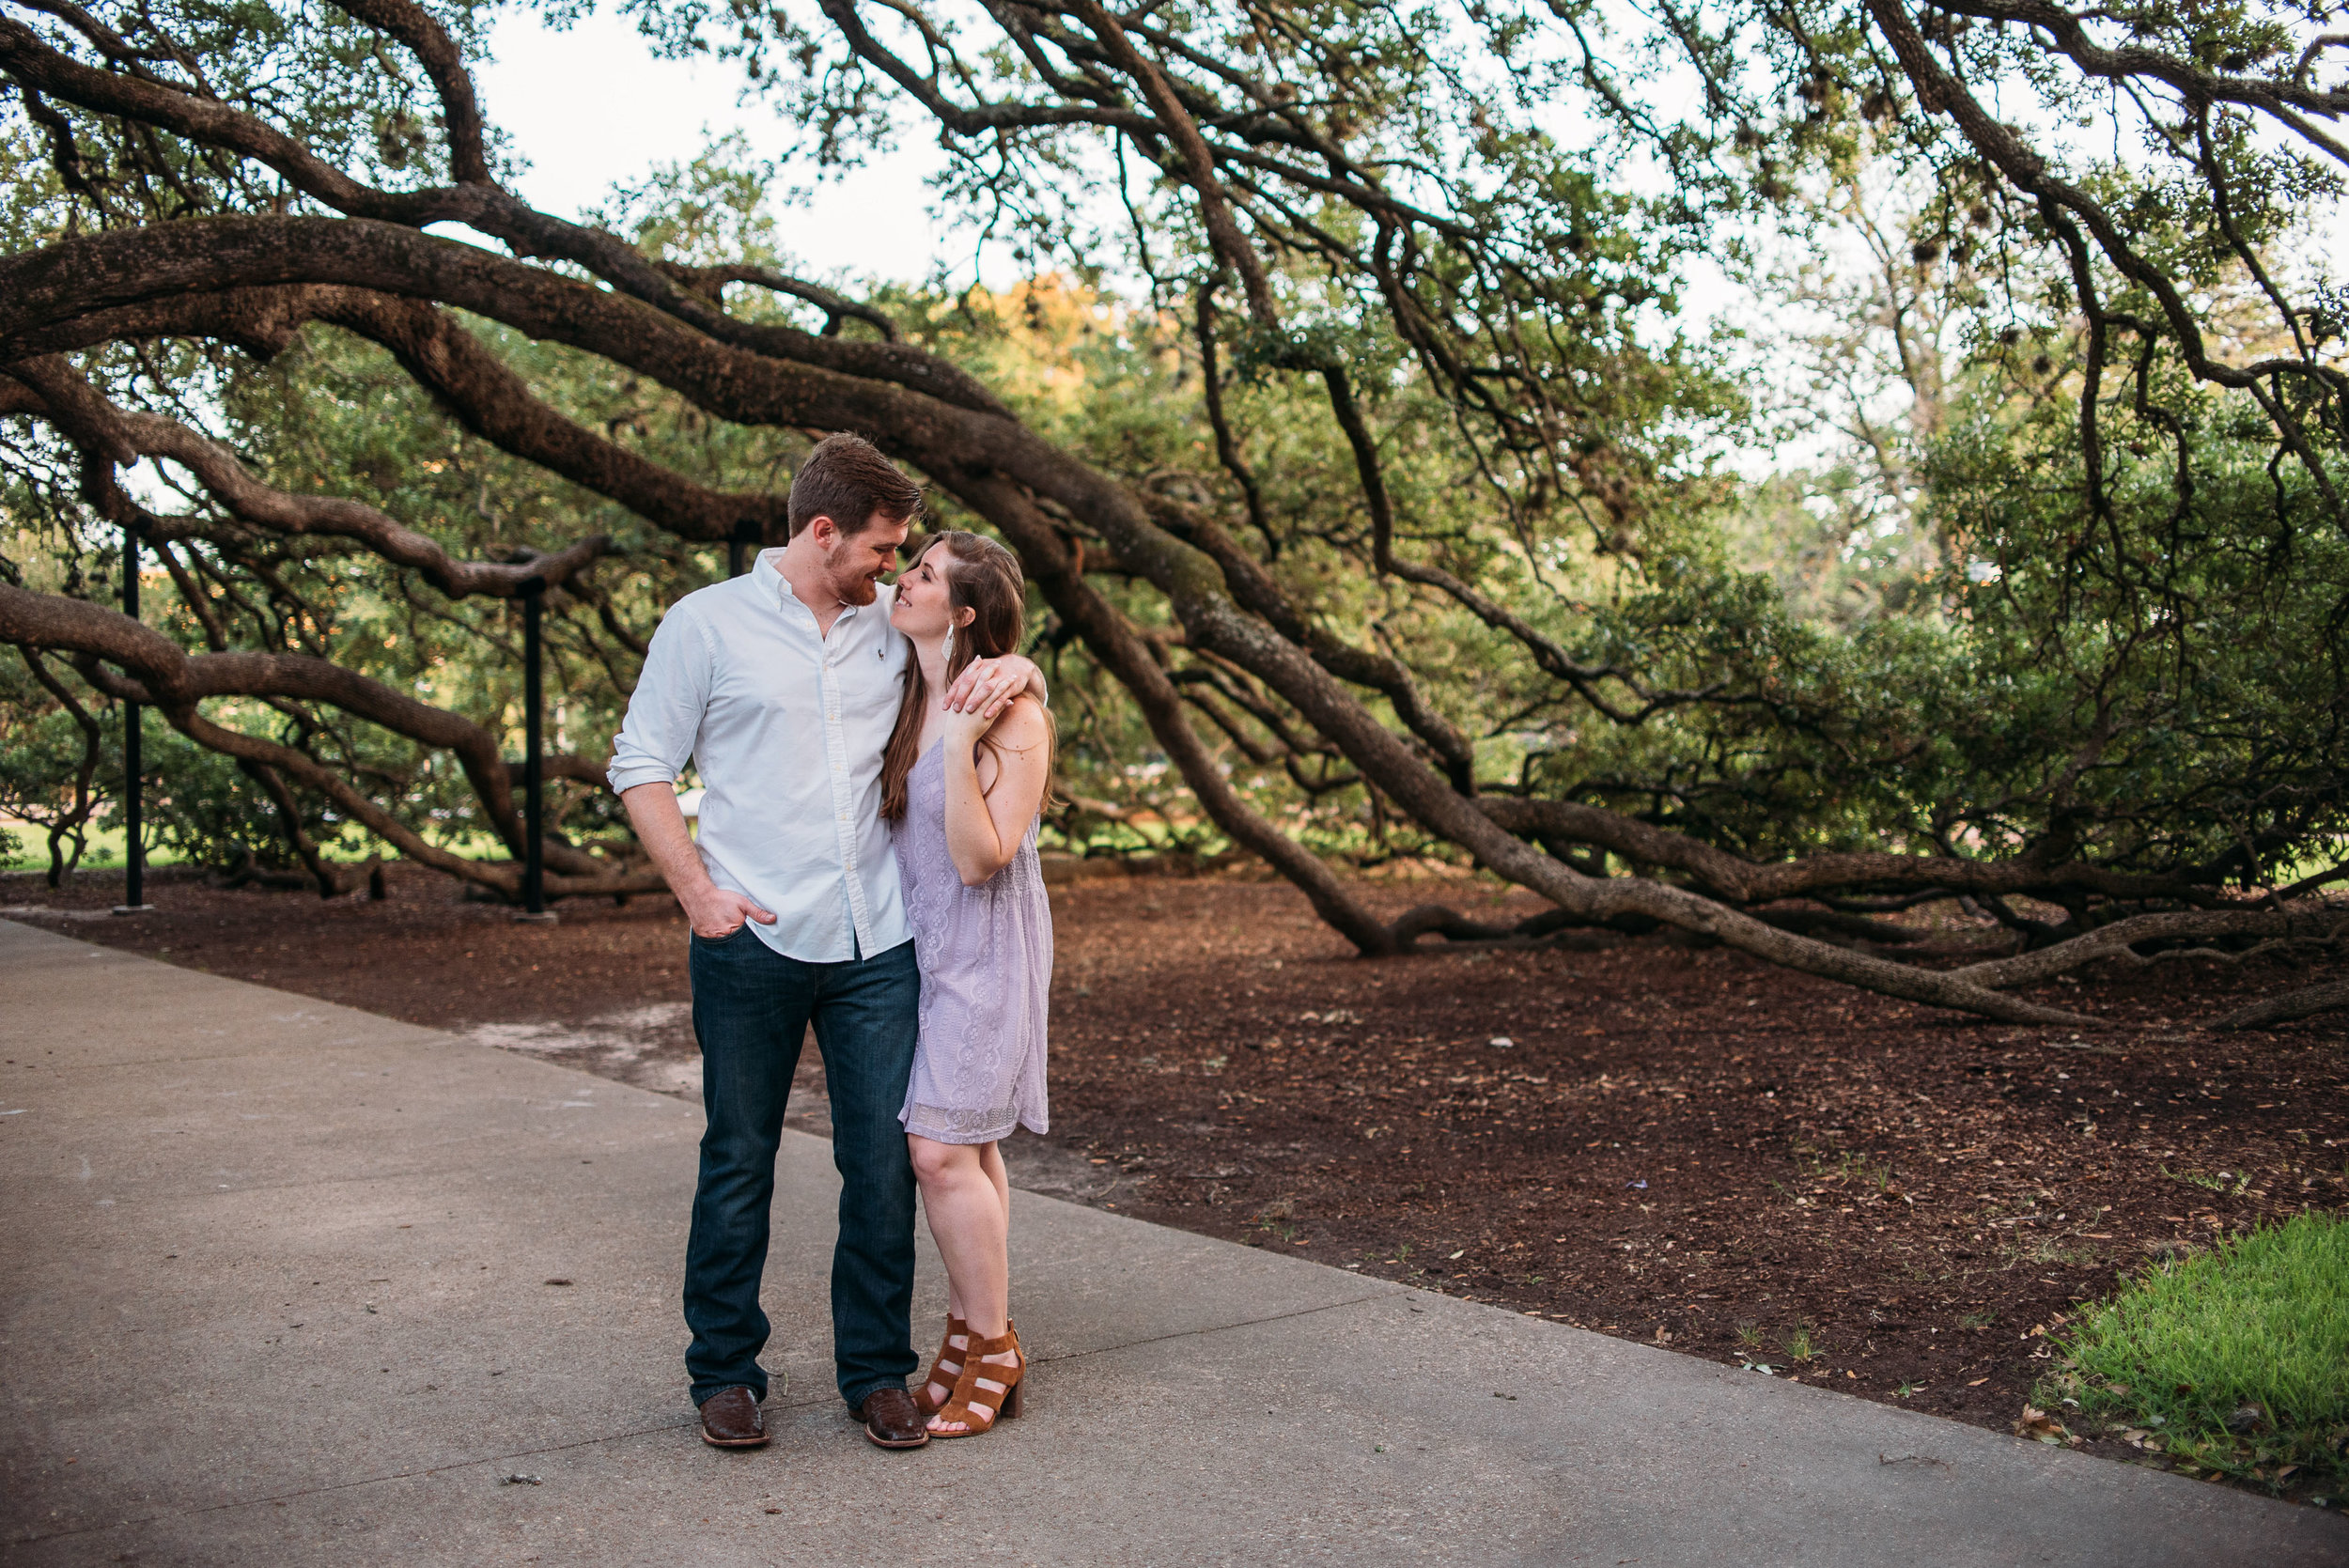 Texas-A&M-University-Engagement-College-Station-Wedding-Photographer-San-Angel-Photo-Mark-Johanna-Century-Tree-28.jpg